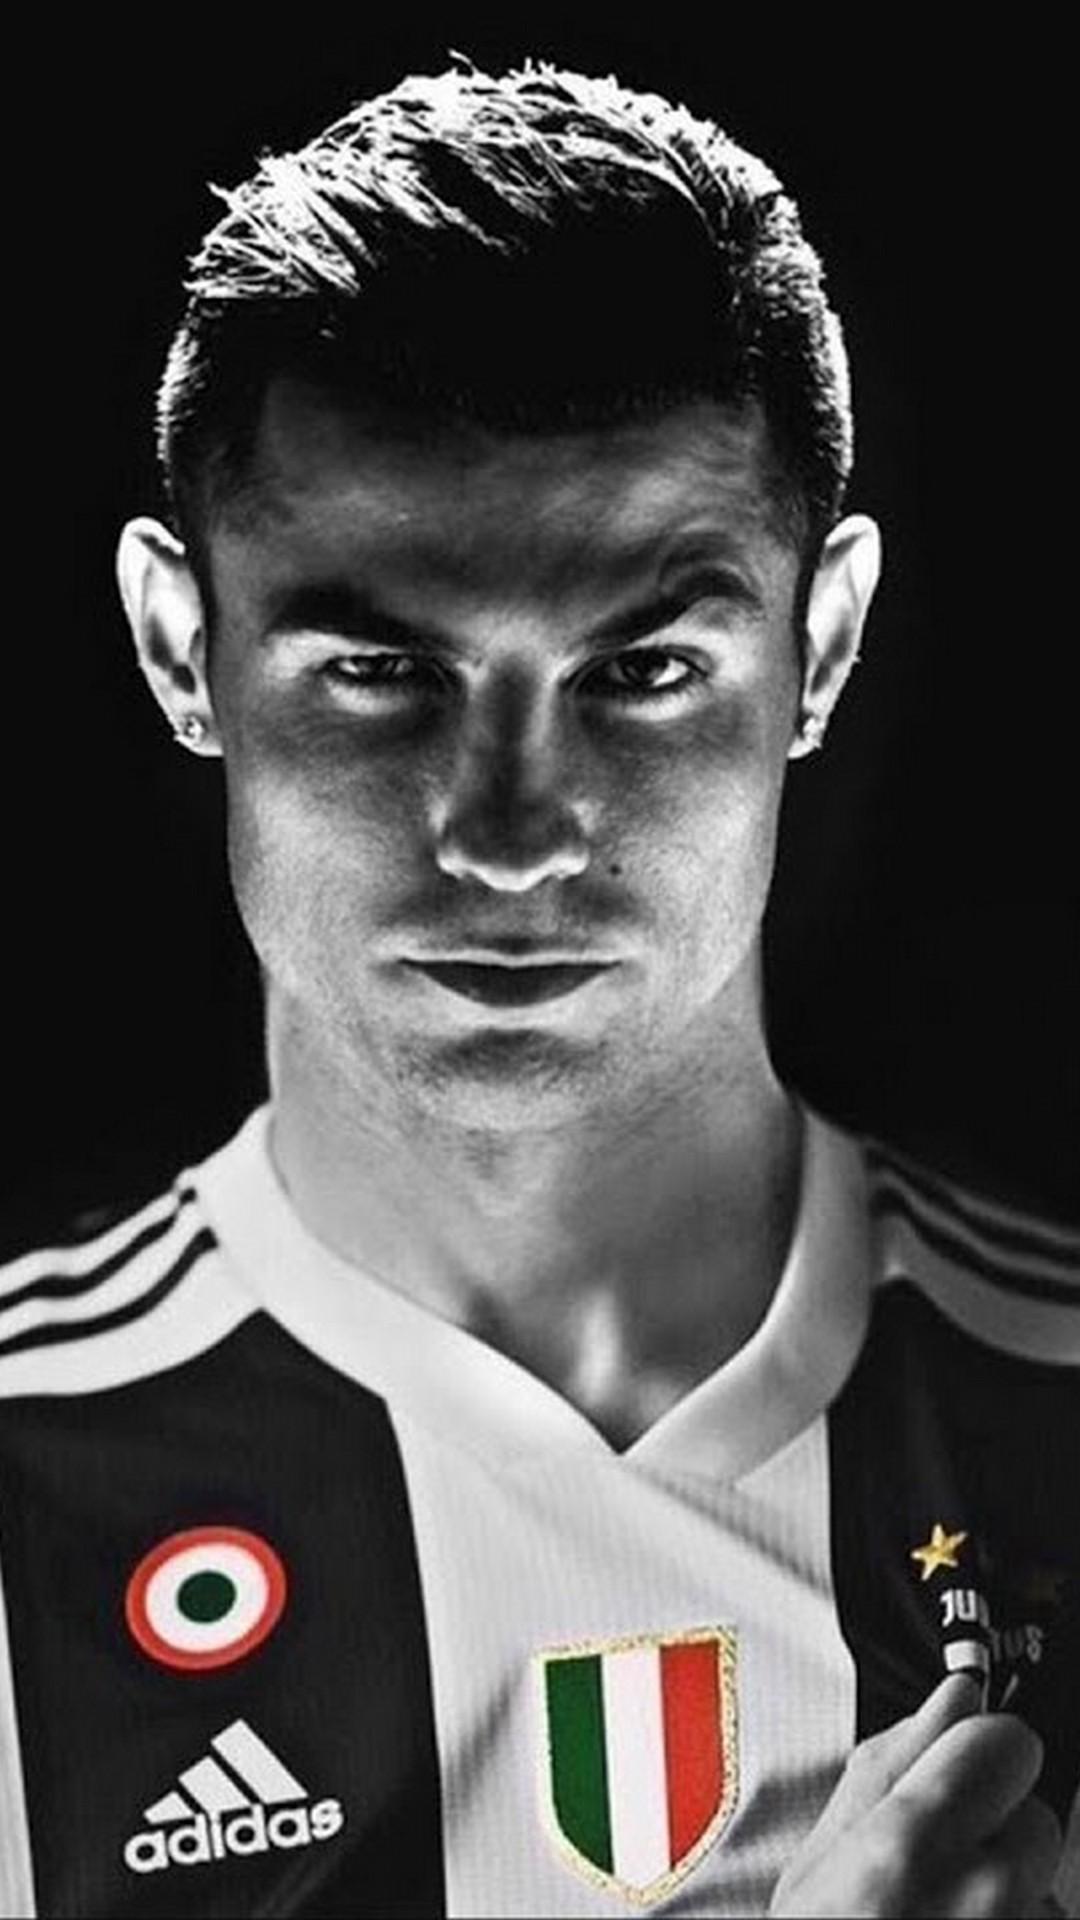 C Ronaldo Juventus Wallpaper iPhone 2020 3D iPhone Wallpaper 1080x1920